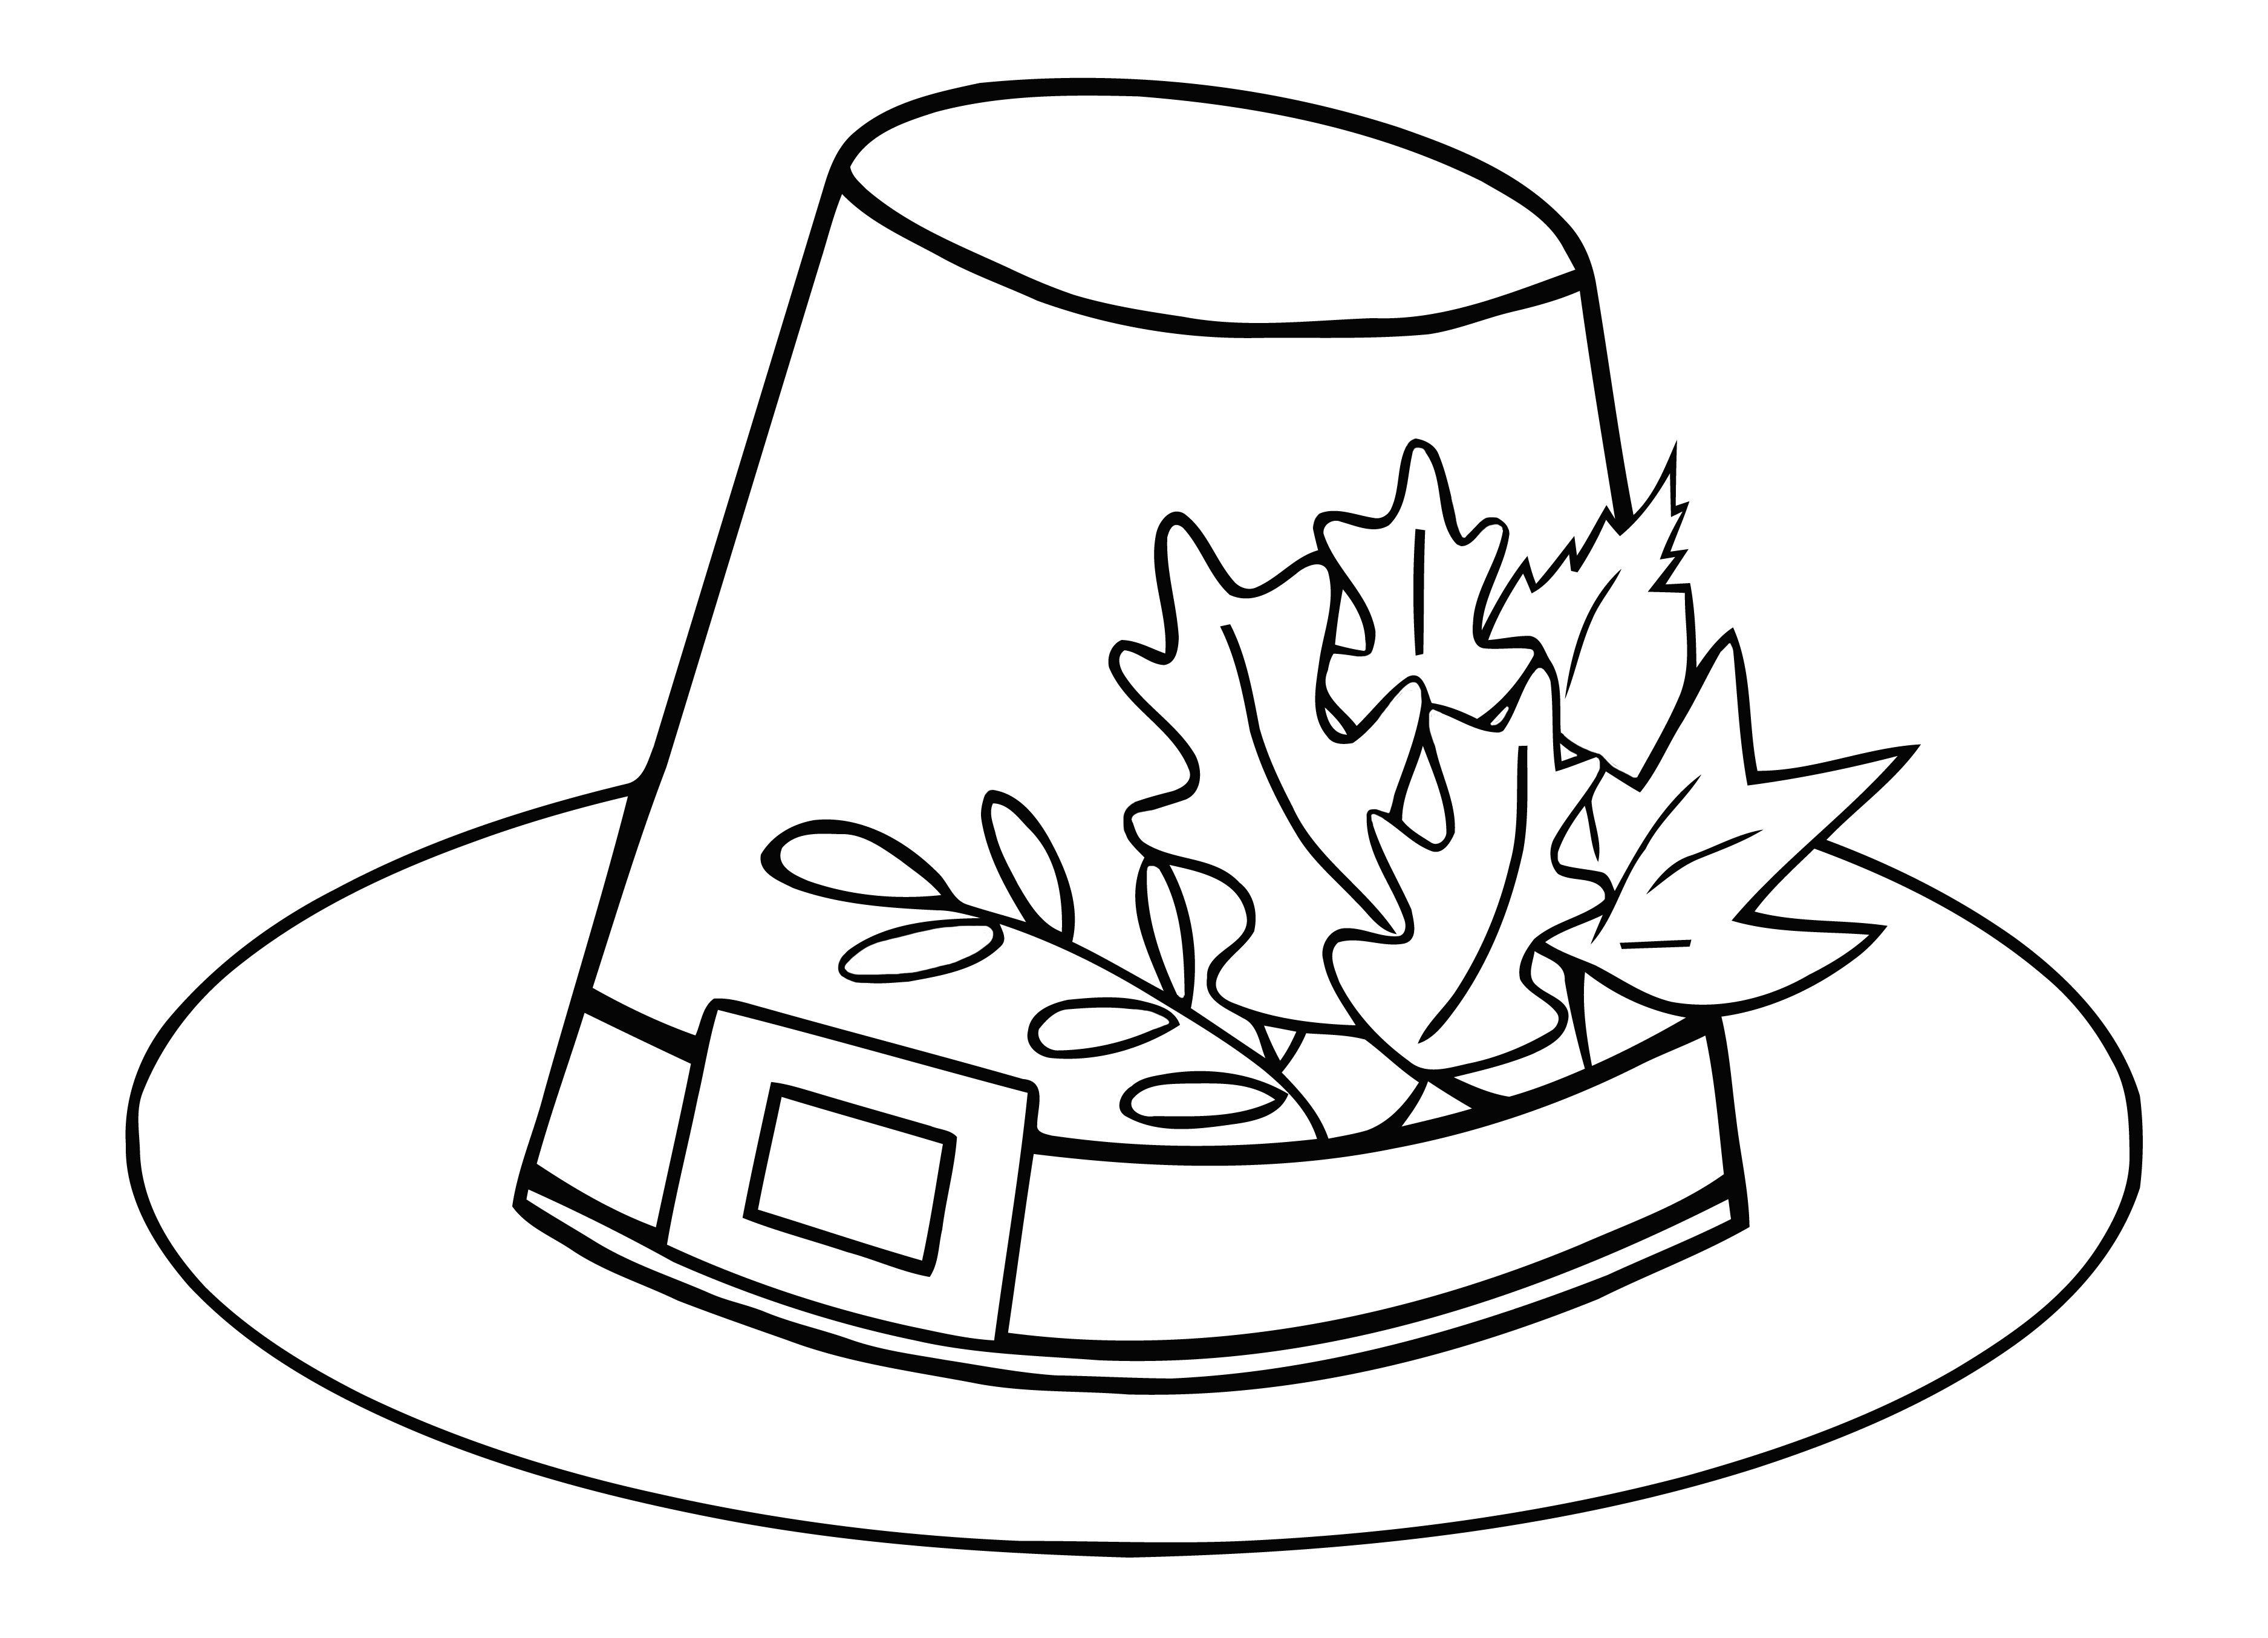 Pilgrim Hat Thanksgiving Free Thanksgiving Coloring Pages Thanksgiving Coloring Sheets Thanksgiving Coloring Pages